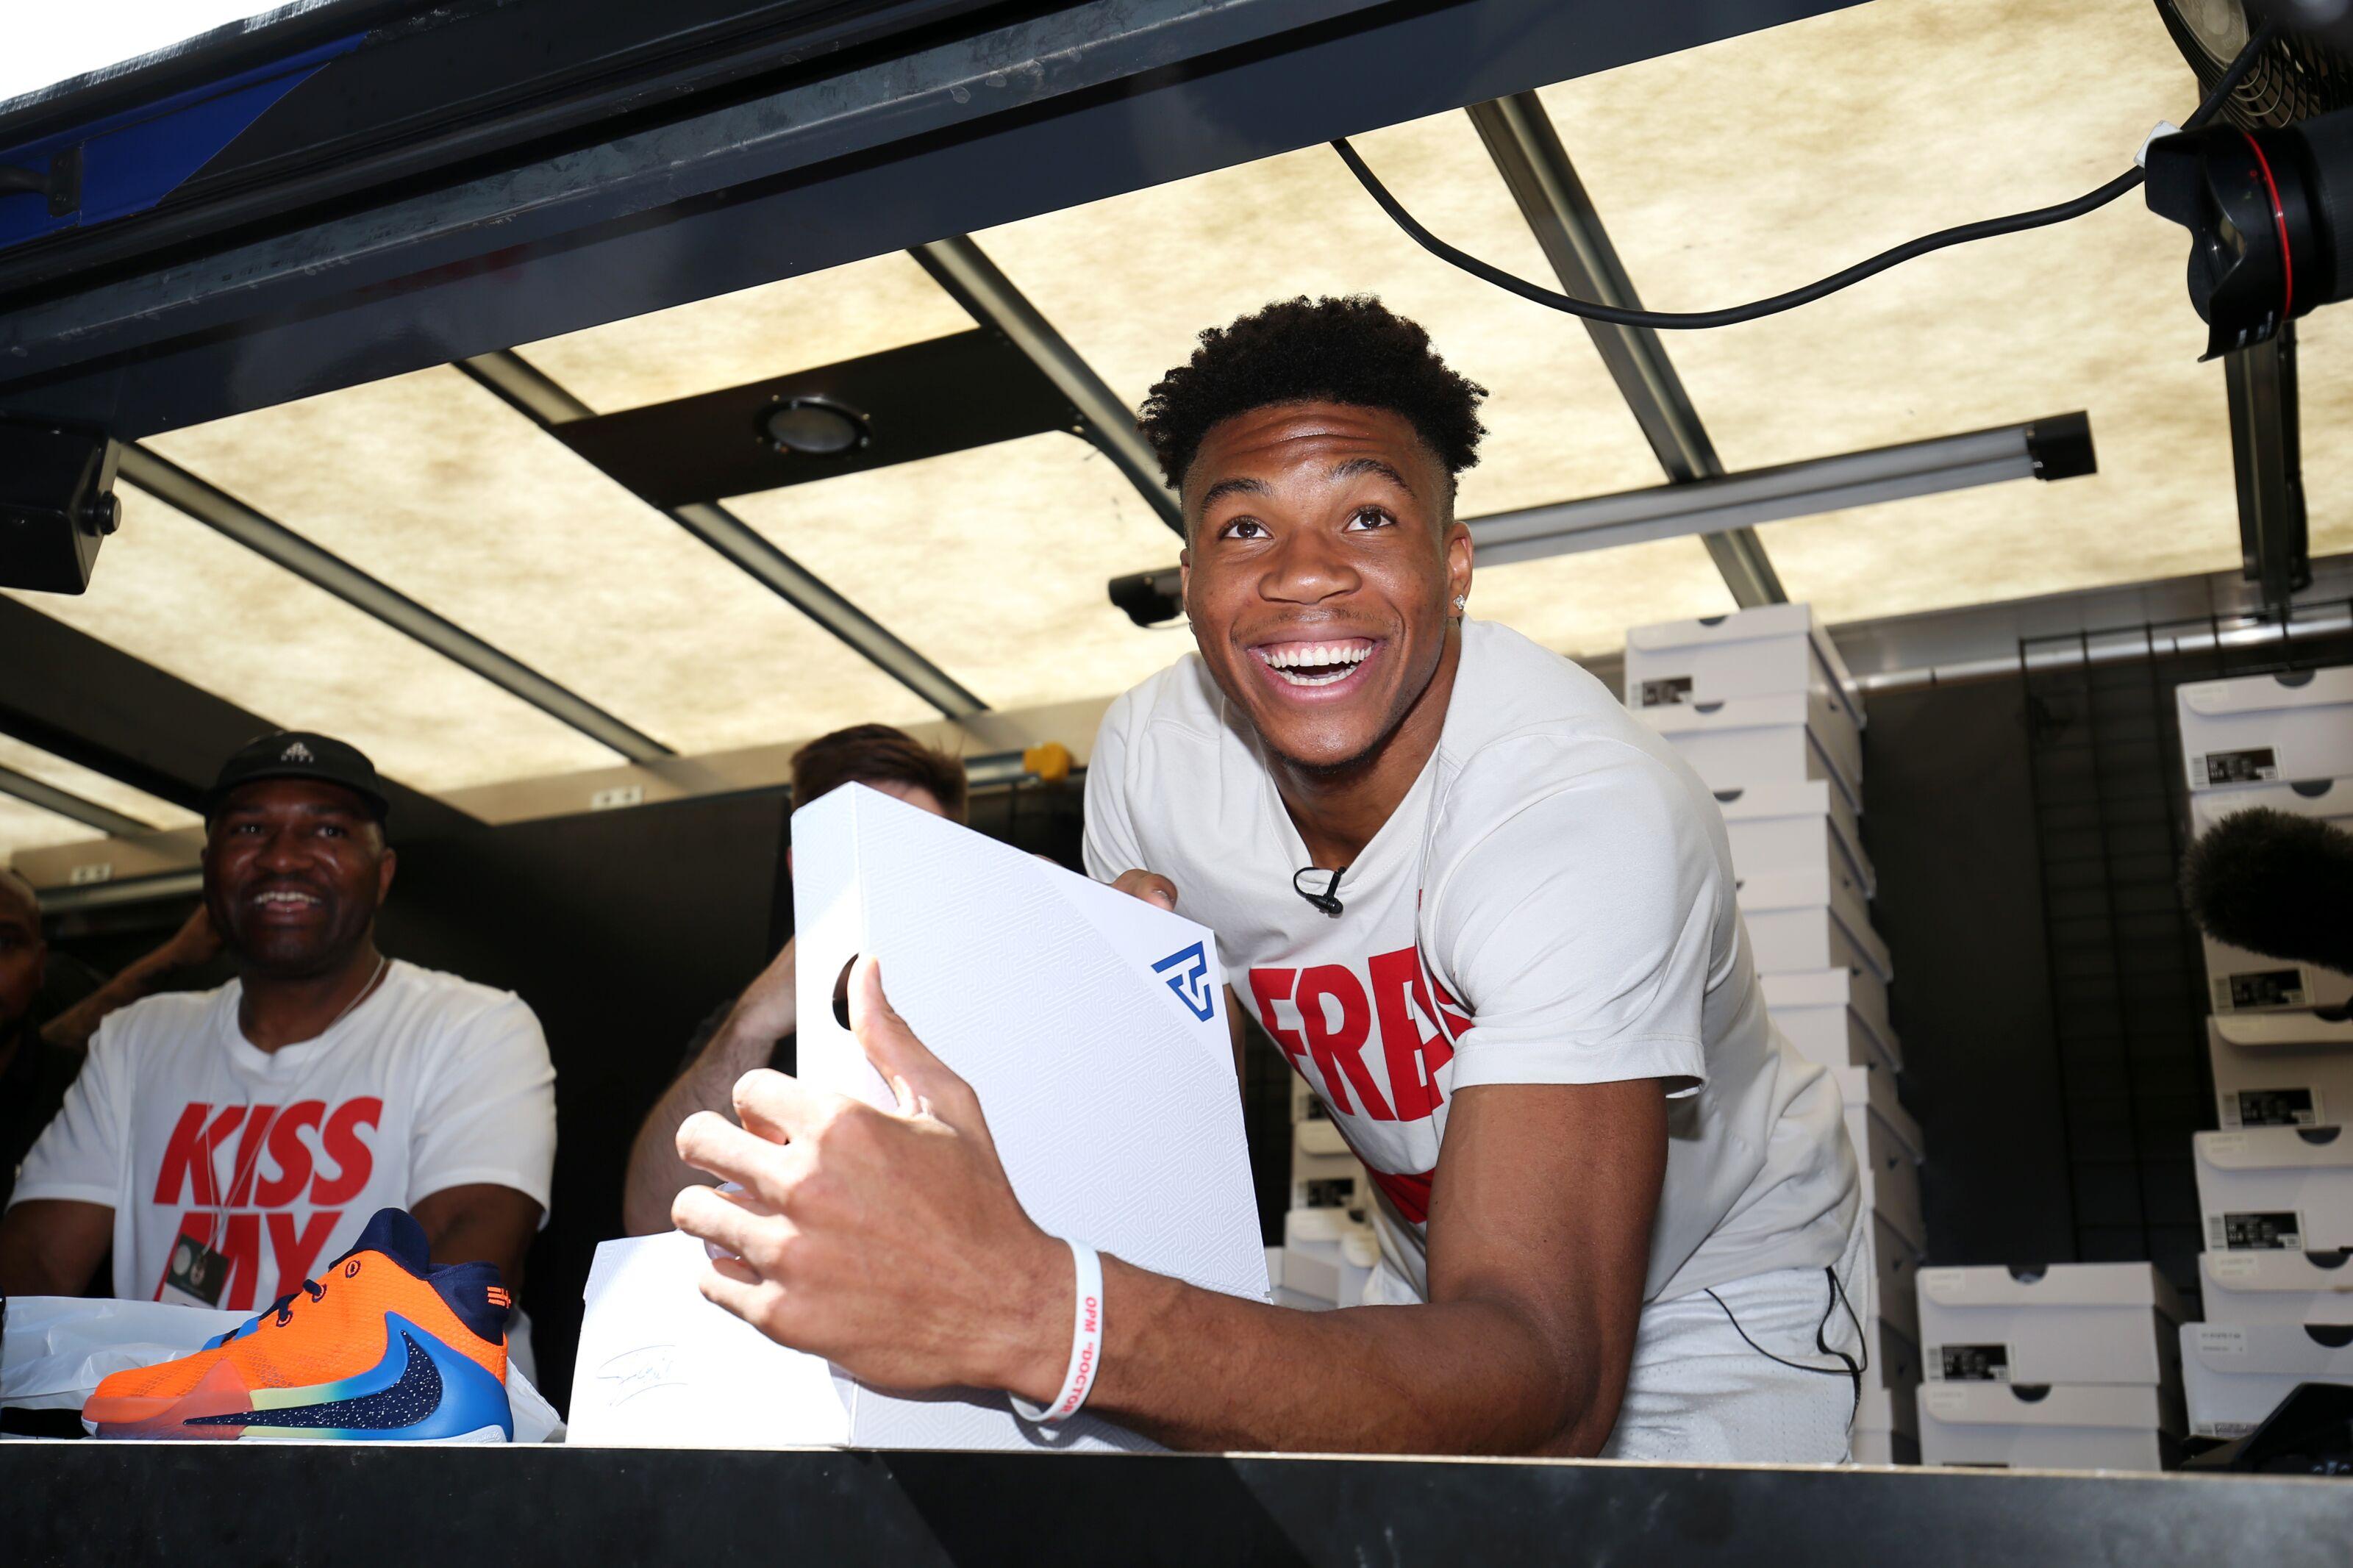 Milwaukee Bucks Daily: Giannis Antetokounmpo's emphatic dunk draws attention